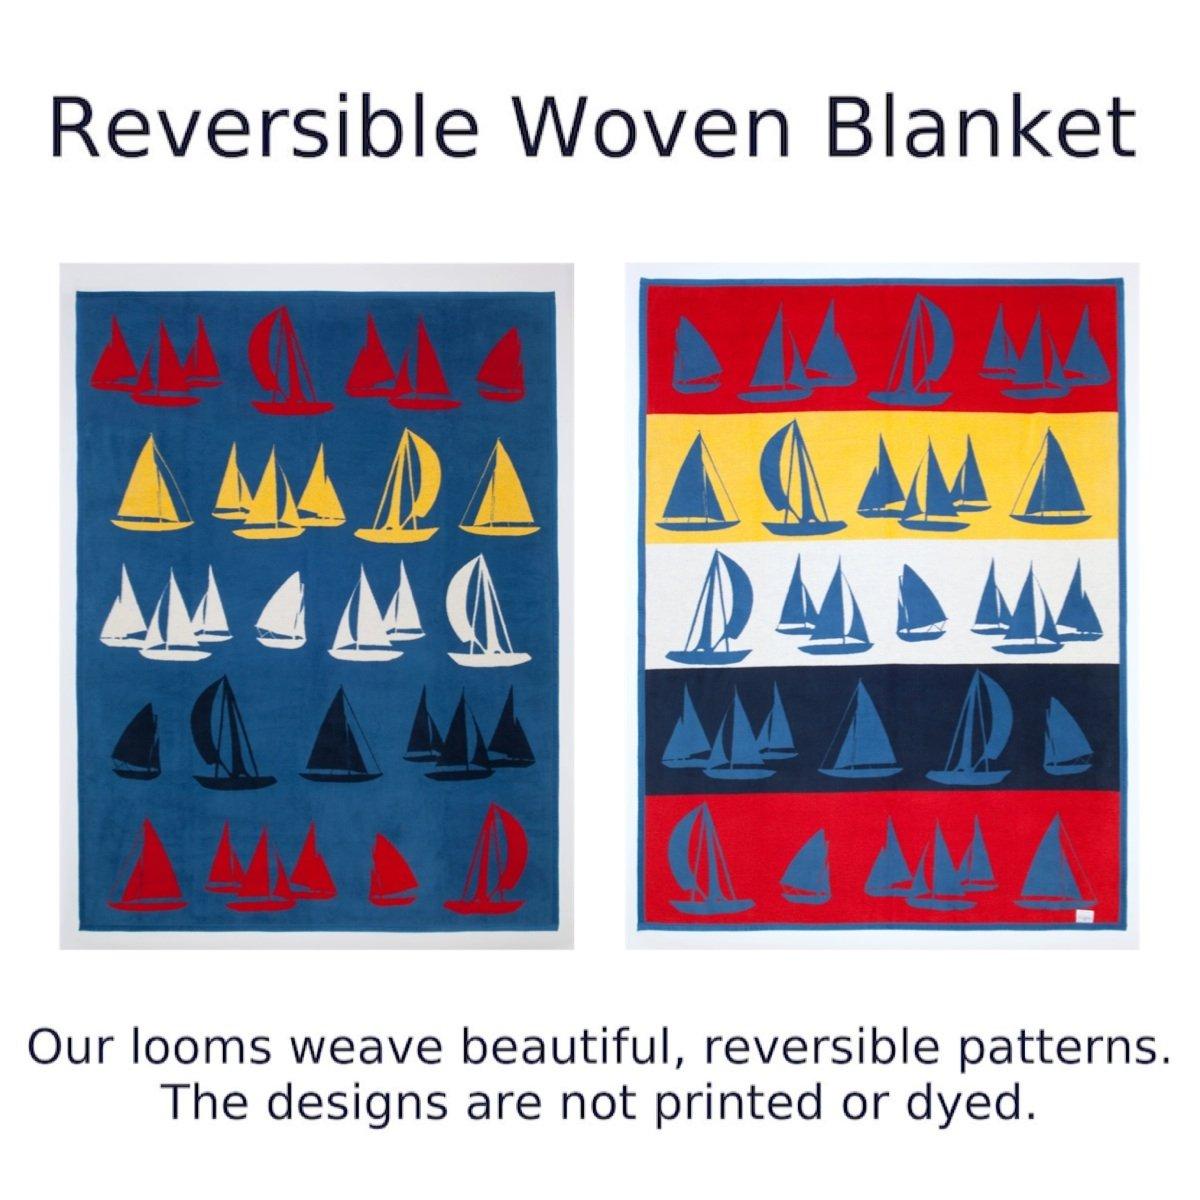 ChappyWrap Oversize Cotton Throw Blanket - Coastal Living Collection by ChappyWrap (Image #3)